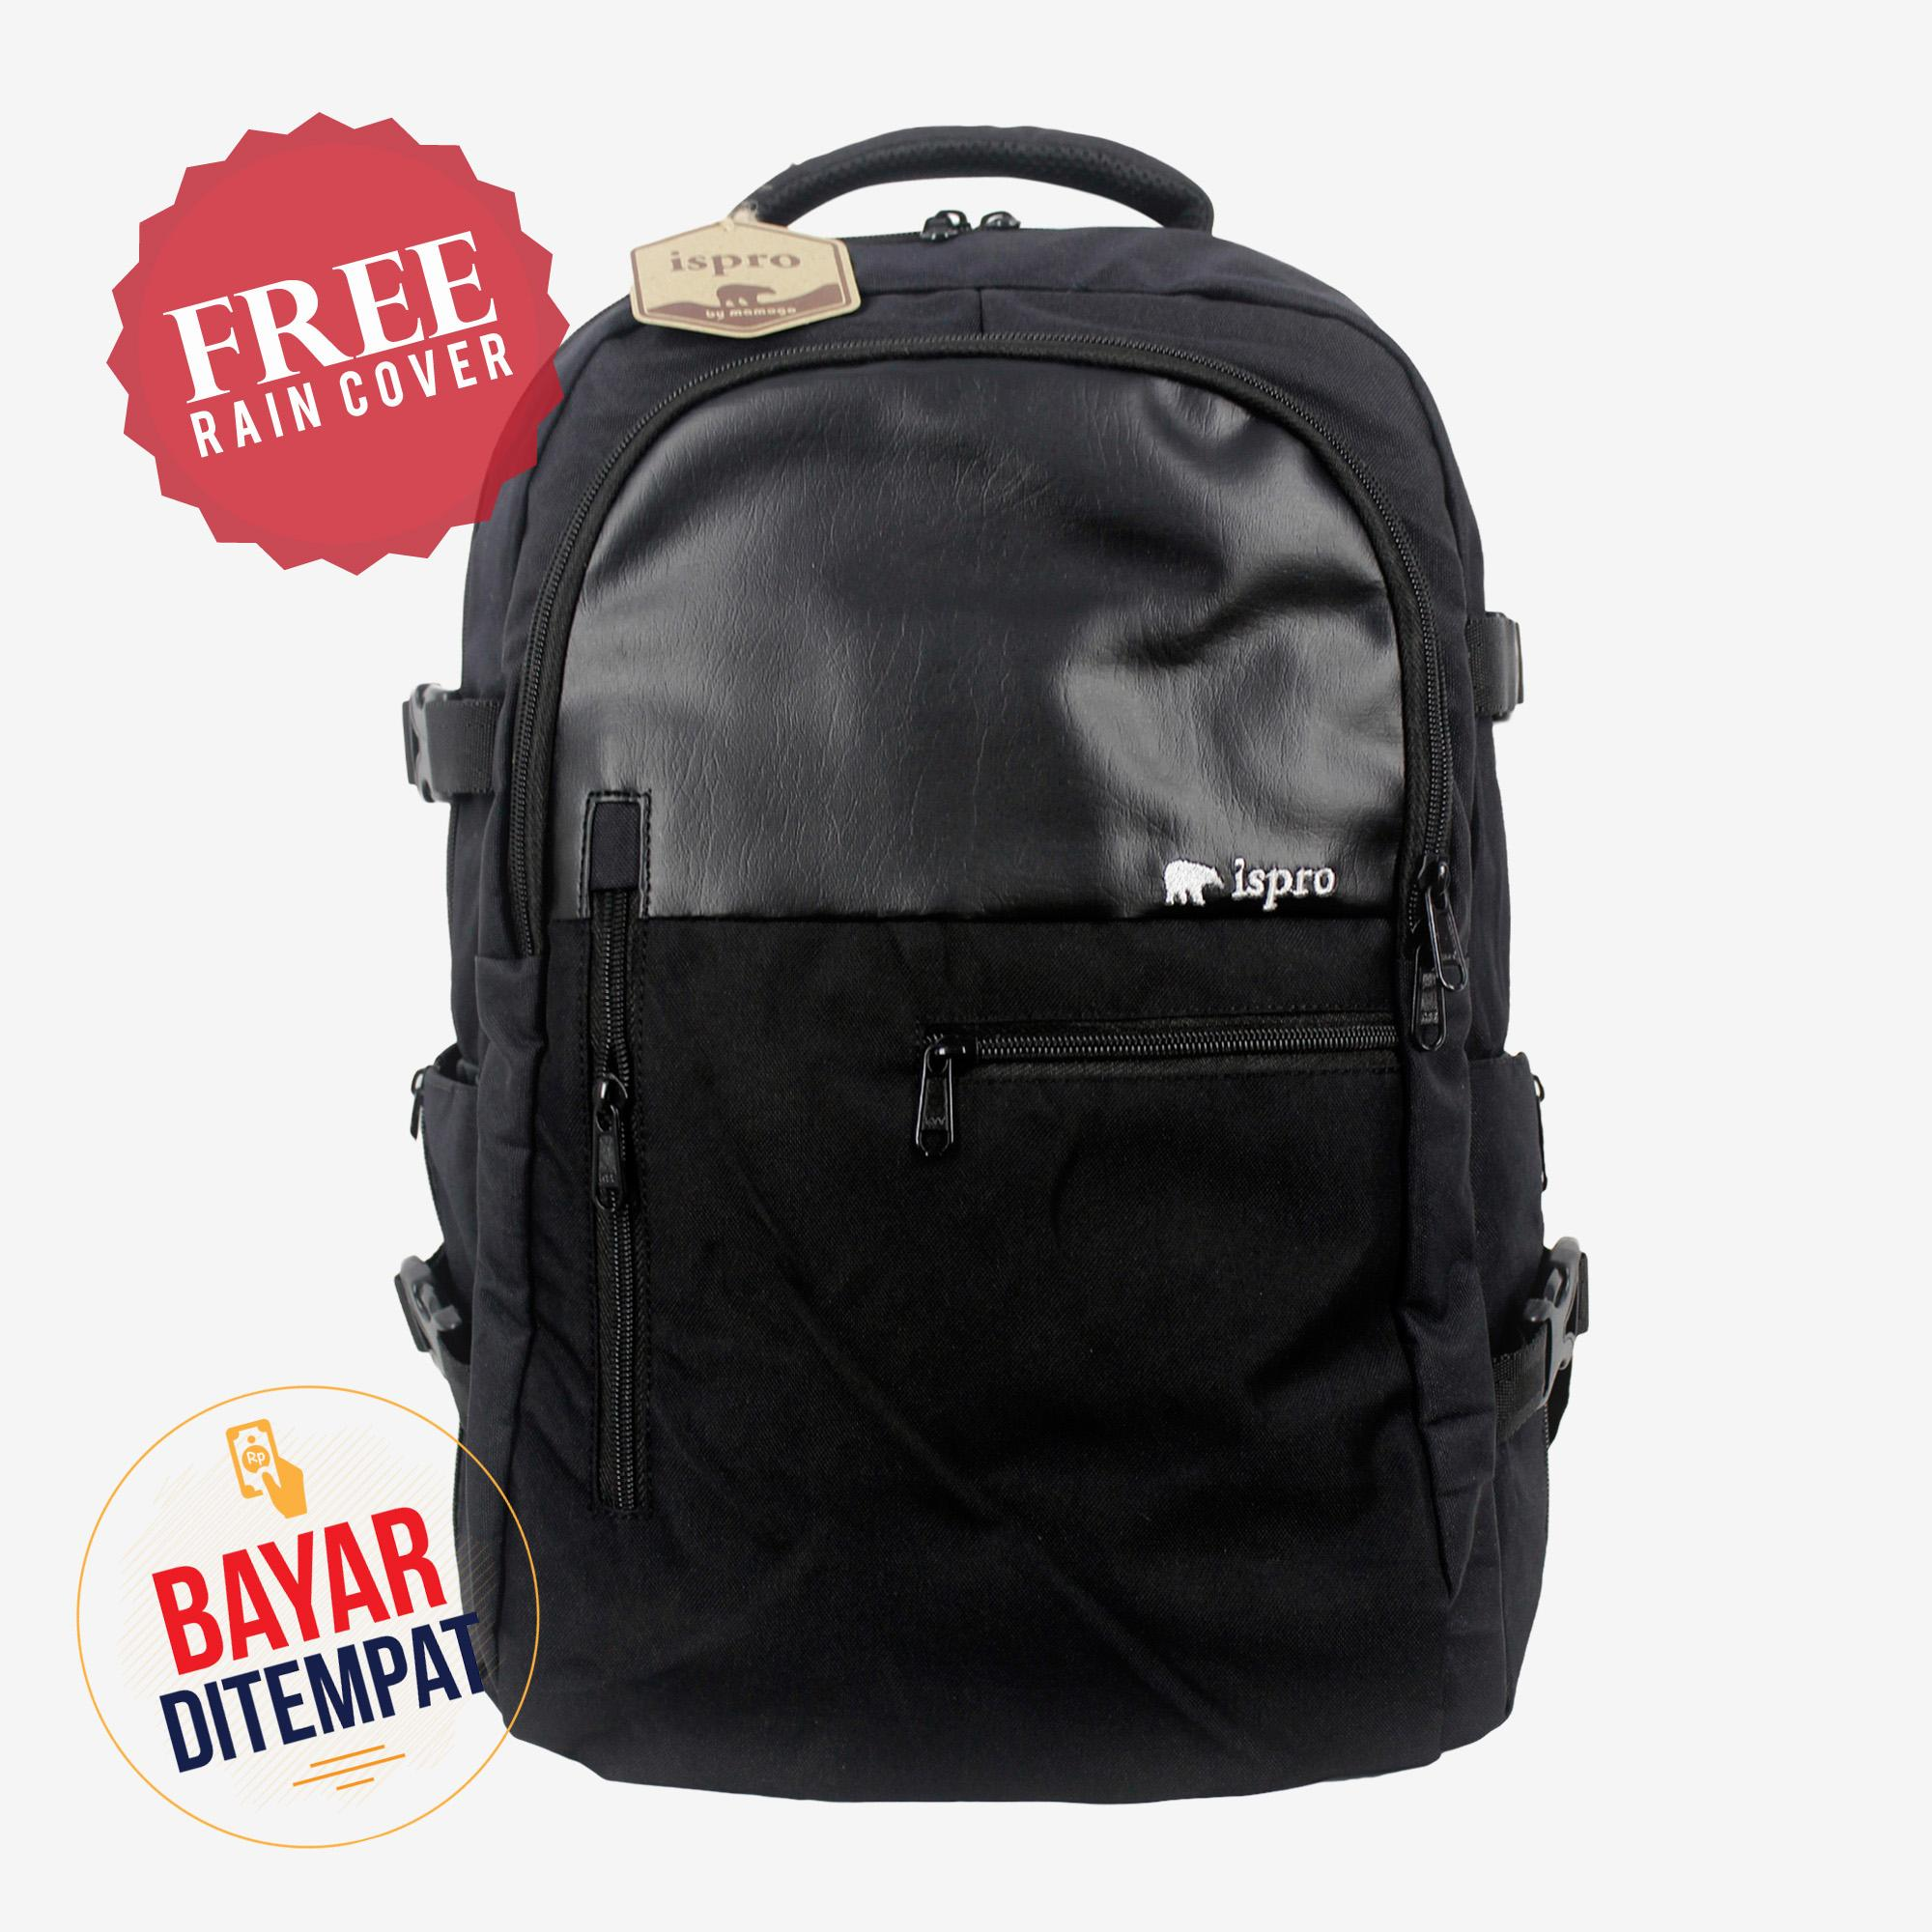 Ispro Original Tas Vintage Backpack - Tas Ransel - Tas Sekolah - Pria -  Wanita e2a6745266